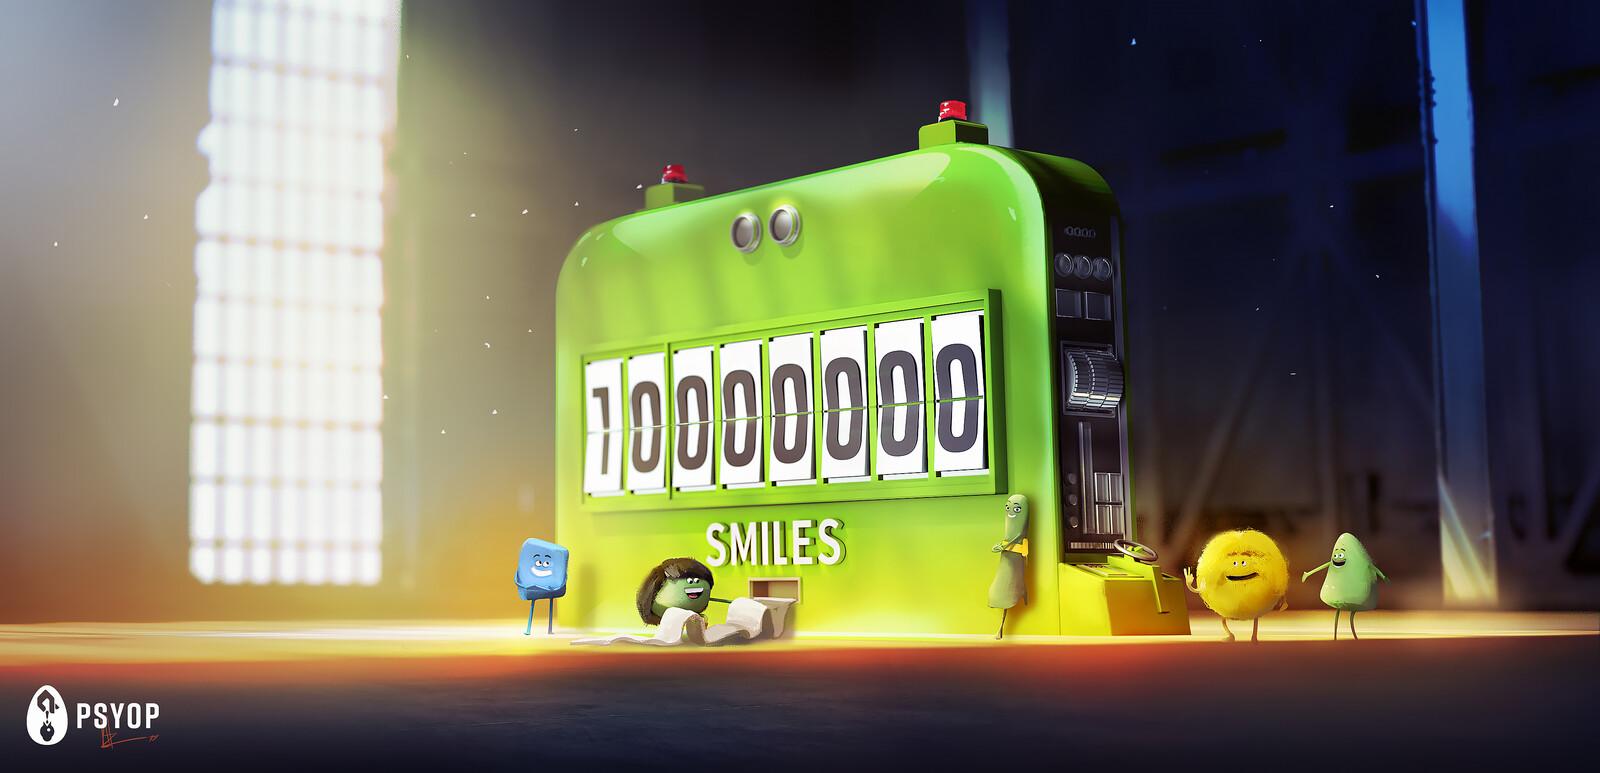 CRICKET WIRELESS 10M Smiles AD / Concept Art